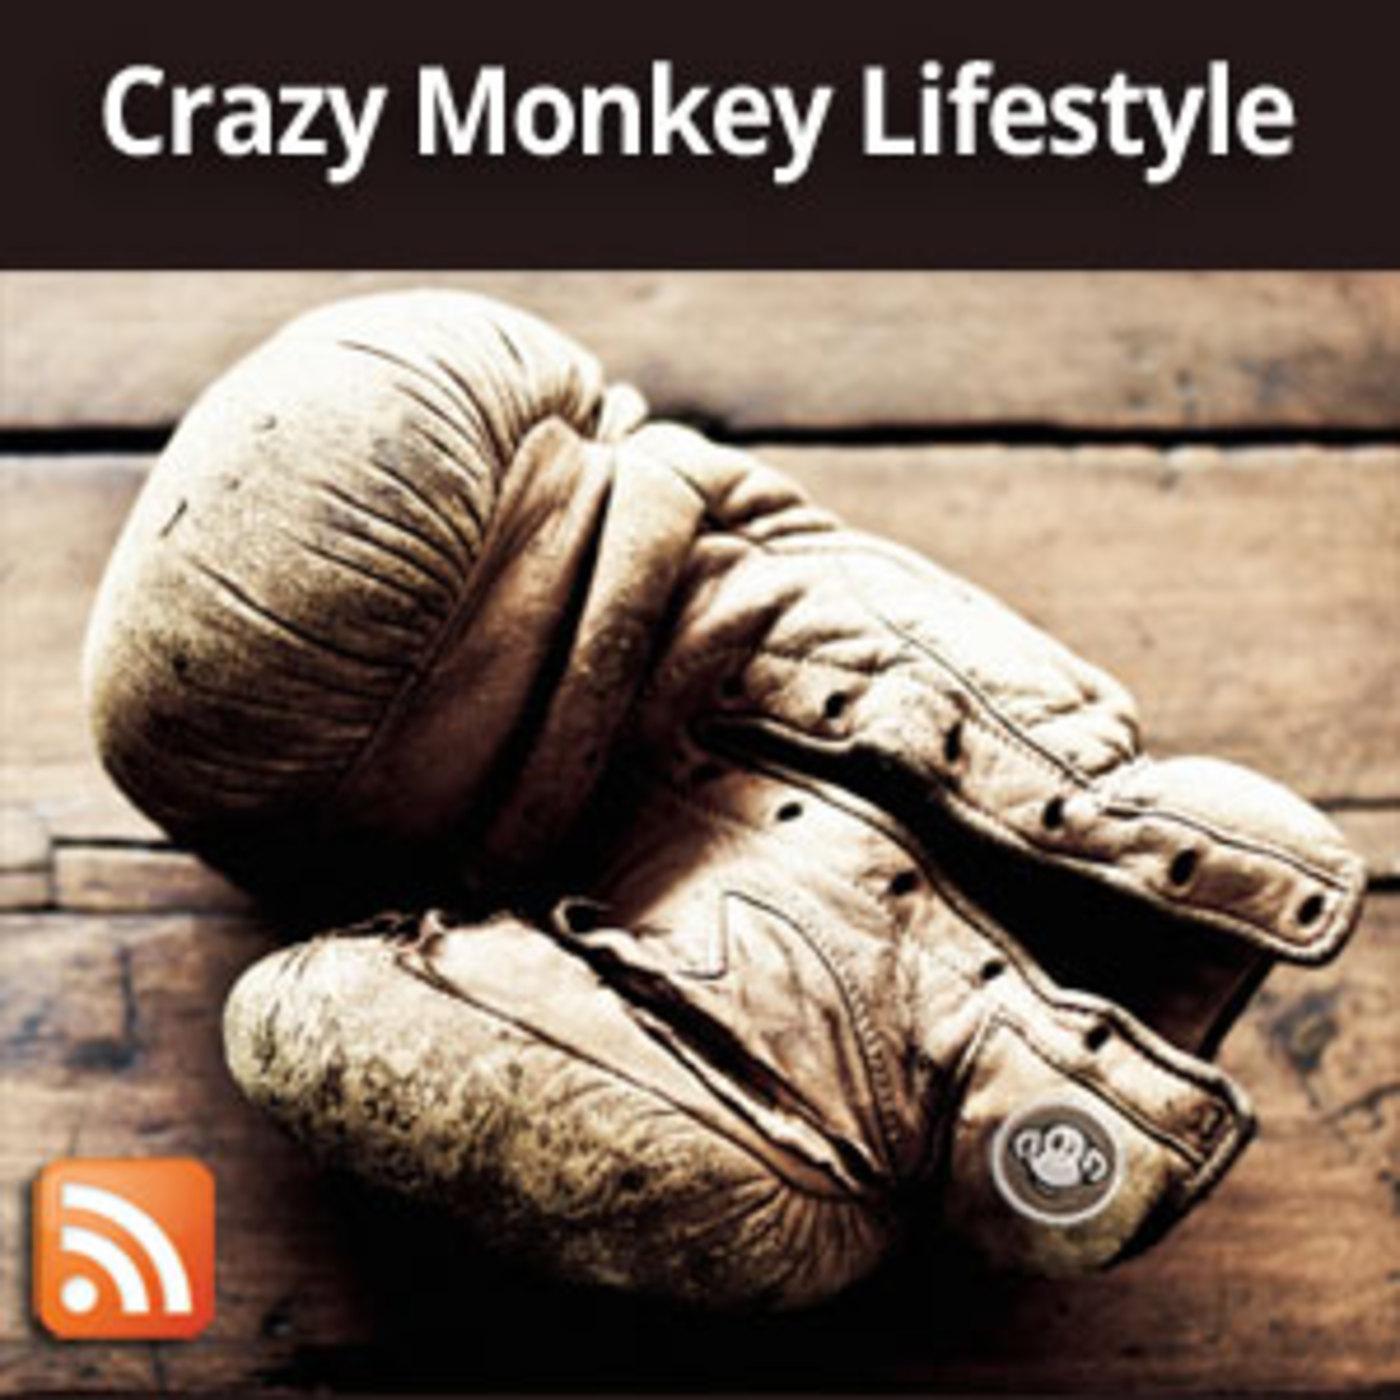 Crazy Monkey Lifestyle Podcast